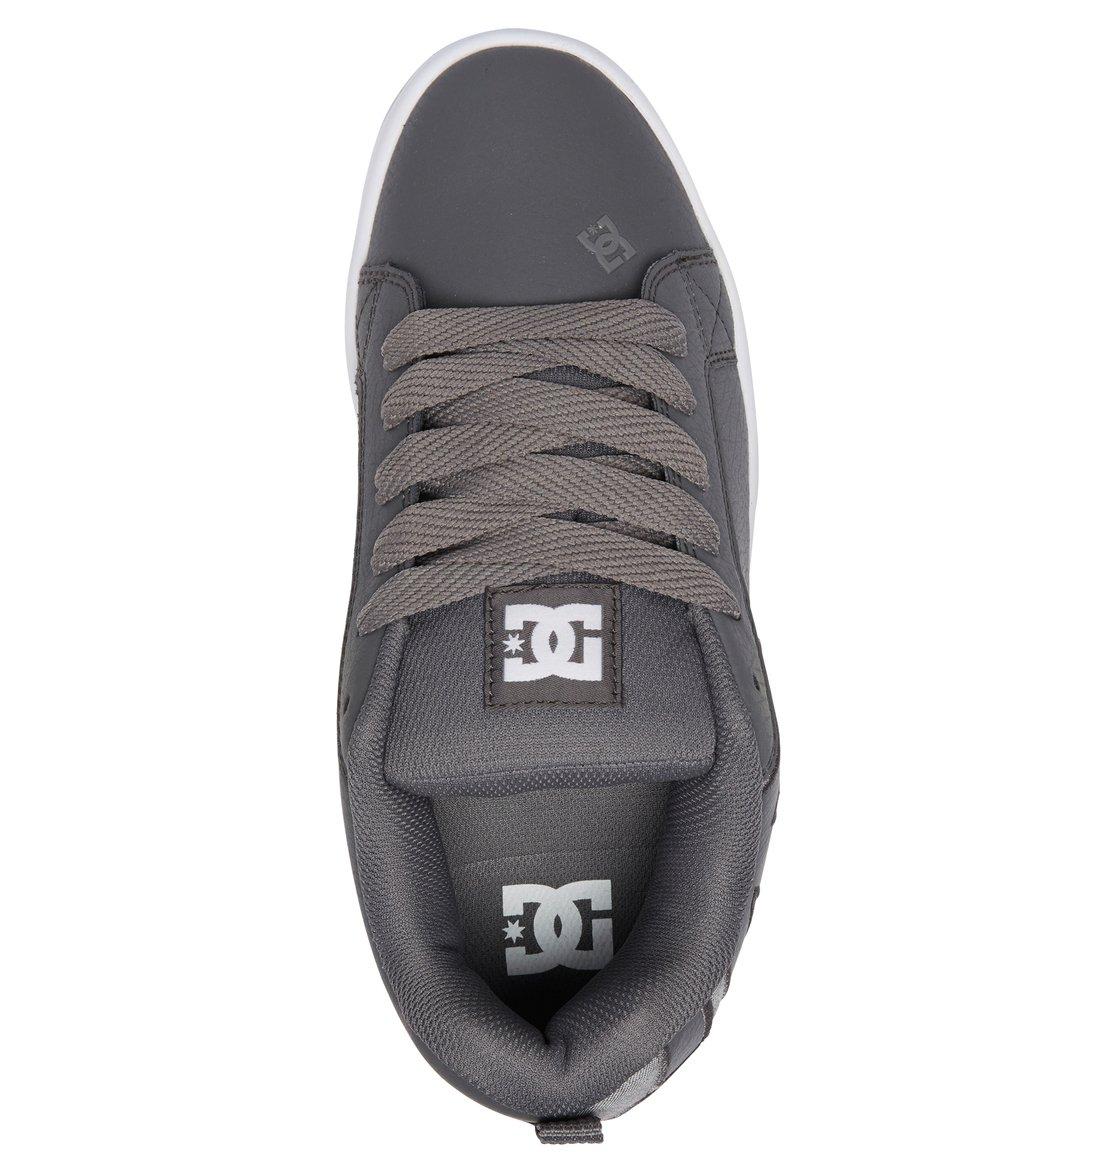 a7e0dce662f DC-Shoes-Court-Graffik-Zapatillas-para-Hombre-ADYS100442 miniatura